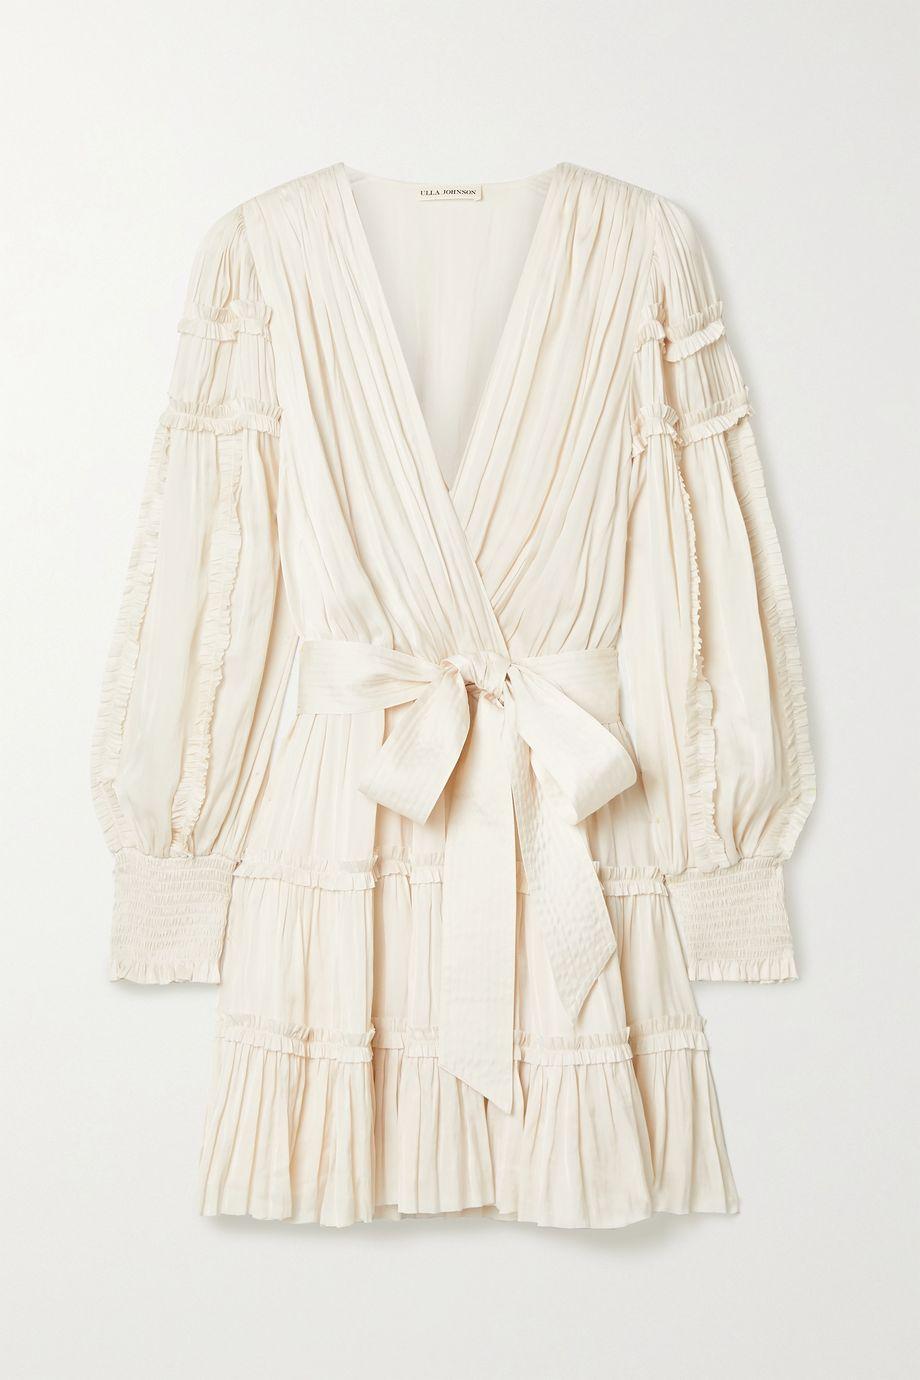 Ulla Johnson Amal belted gathered satin mini dress